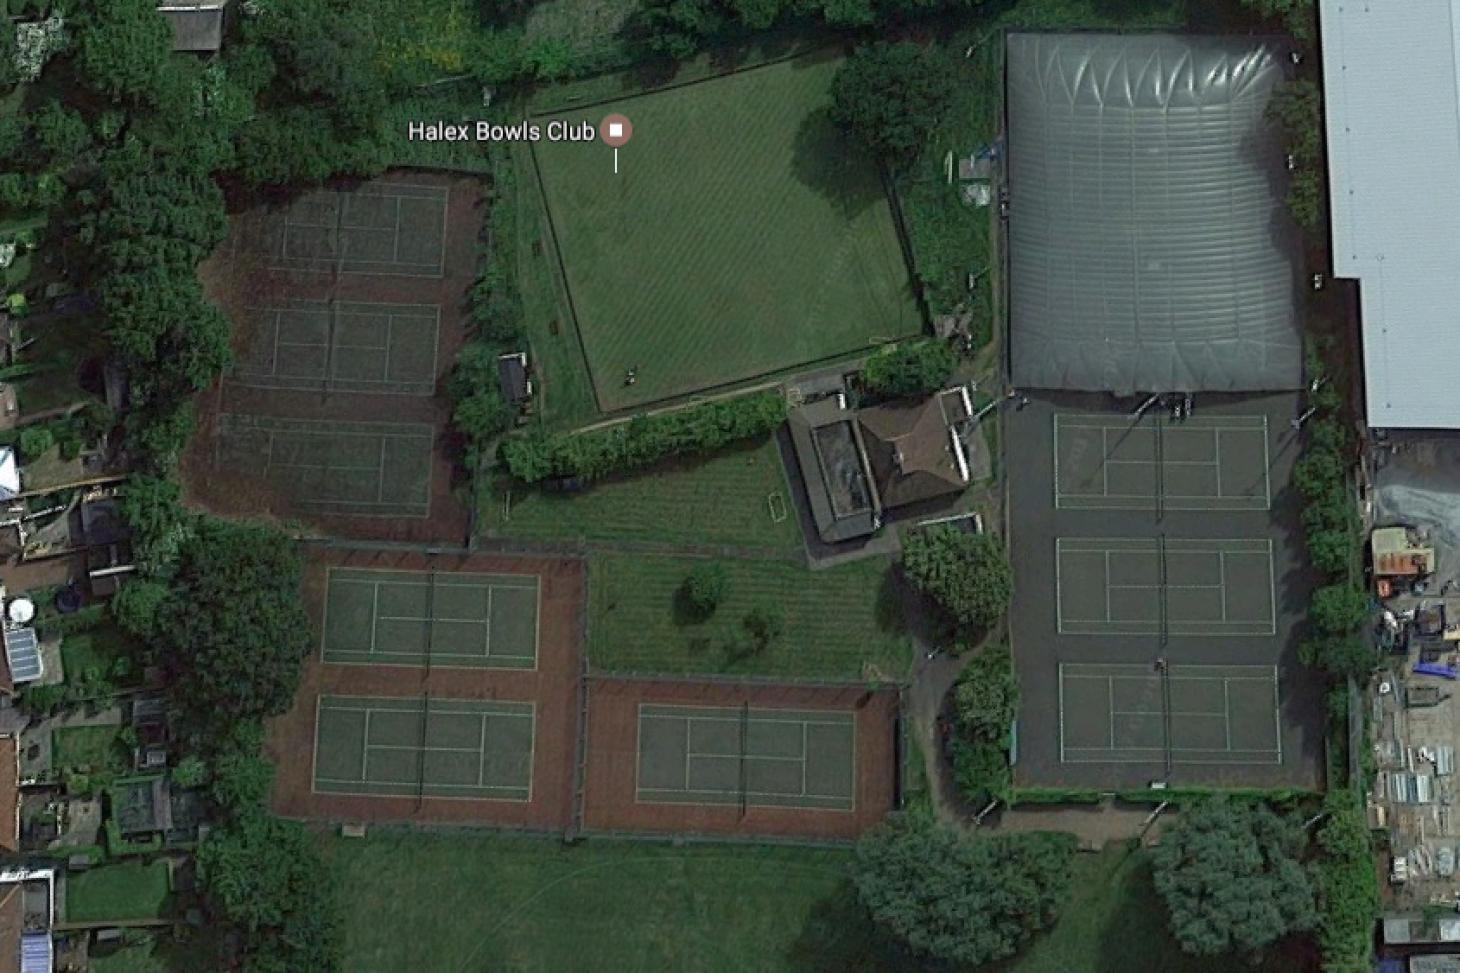 Chingford School of Tennis  Outdoor | Hard (macadam) tennis court